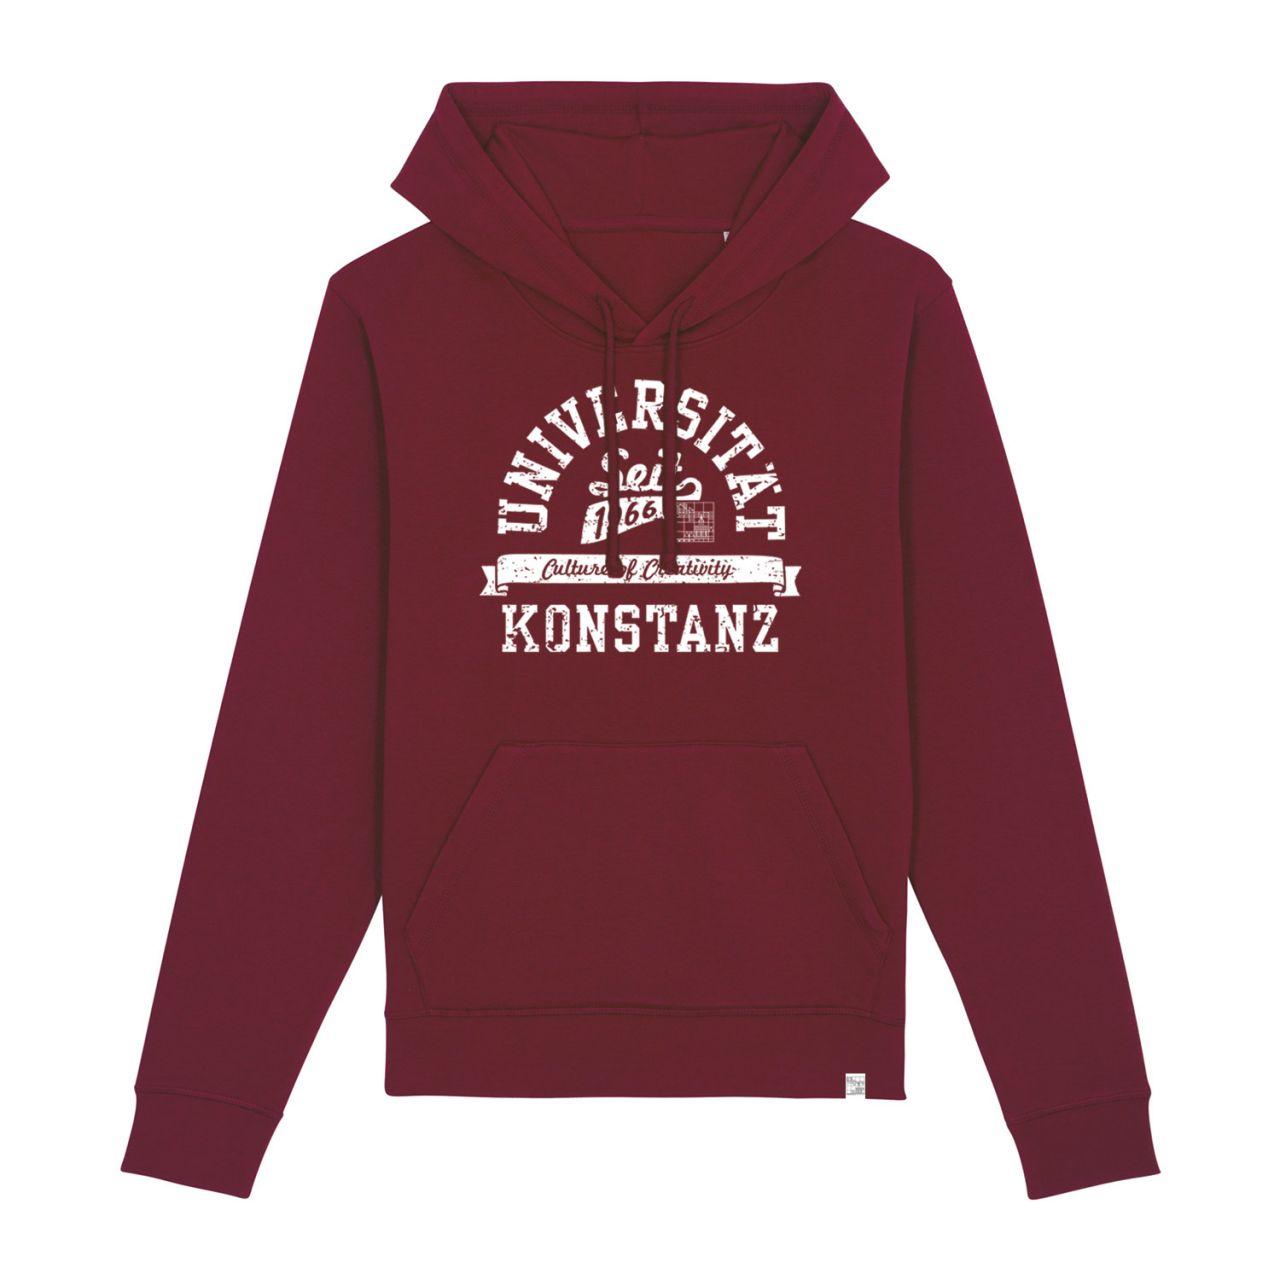 Unisex Organic Hooded Sweatshirt, burgundy, berkley